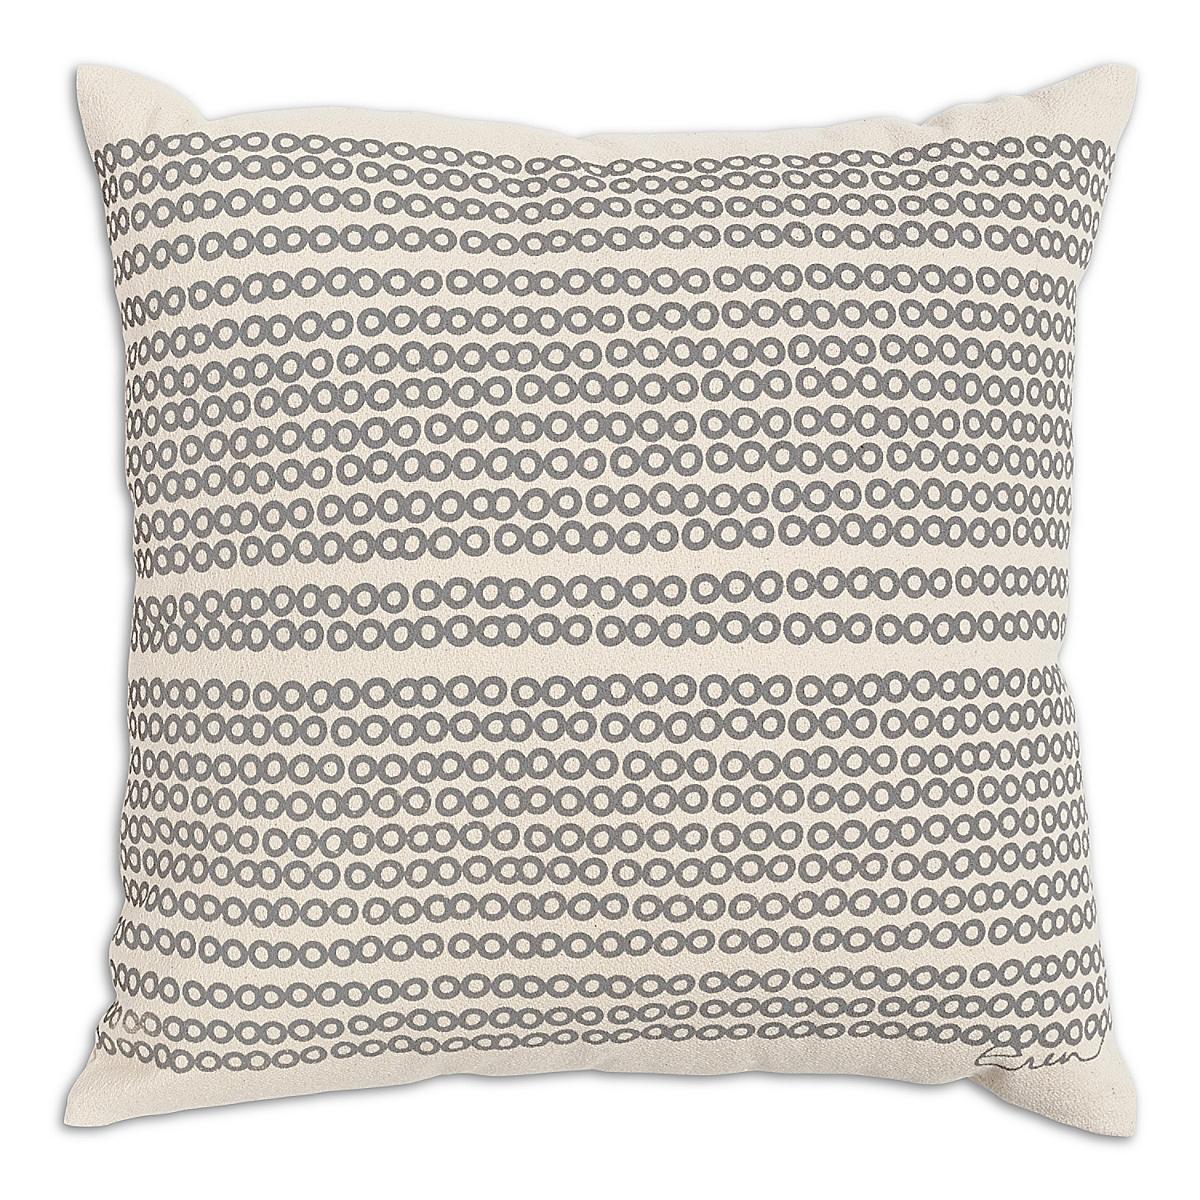 "20"" x 20"" - Decco Dots Pillow: Slate"